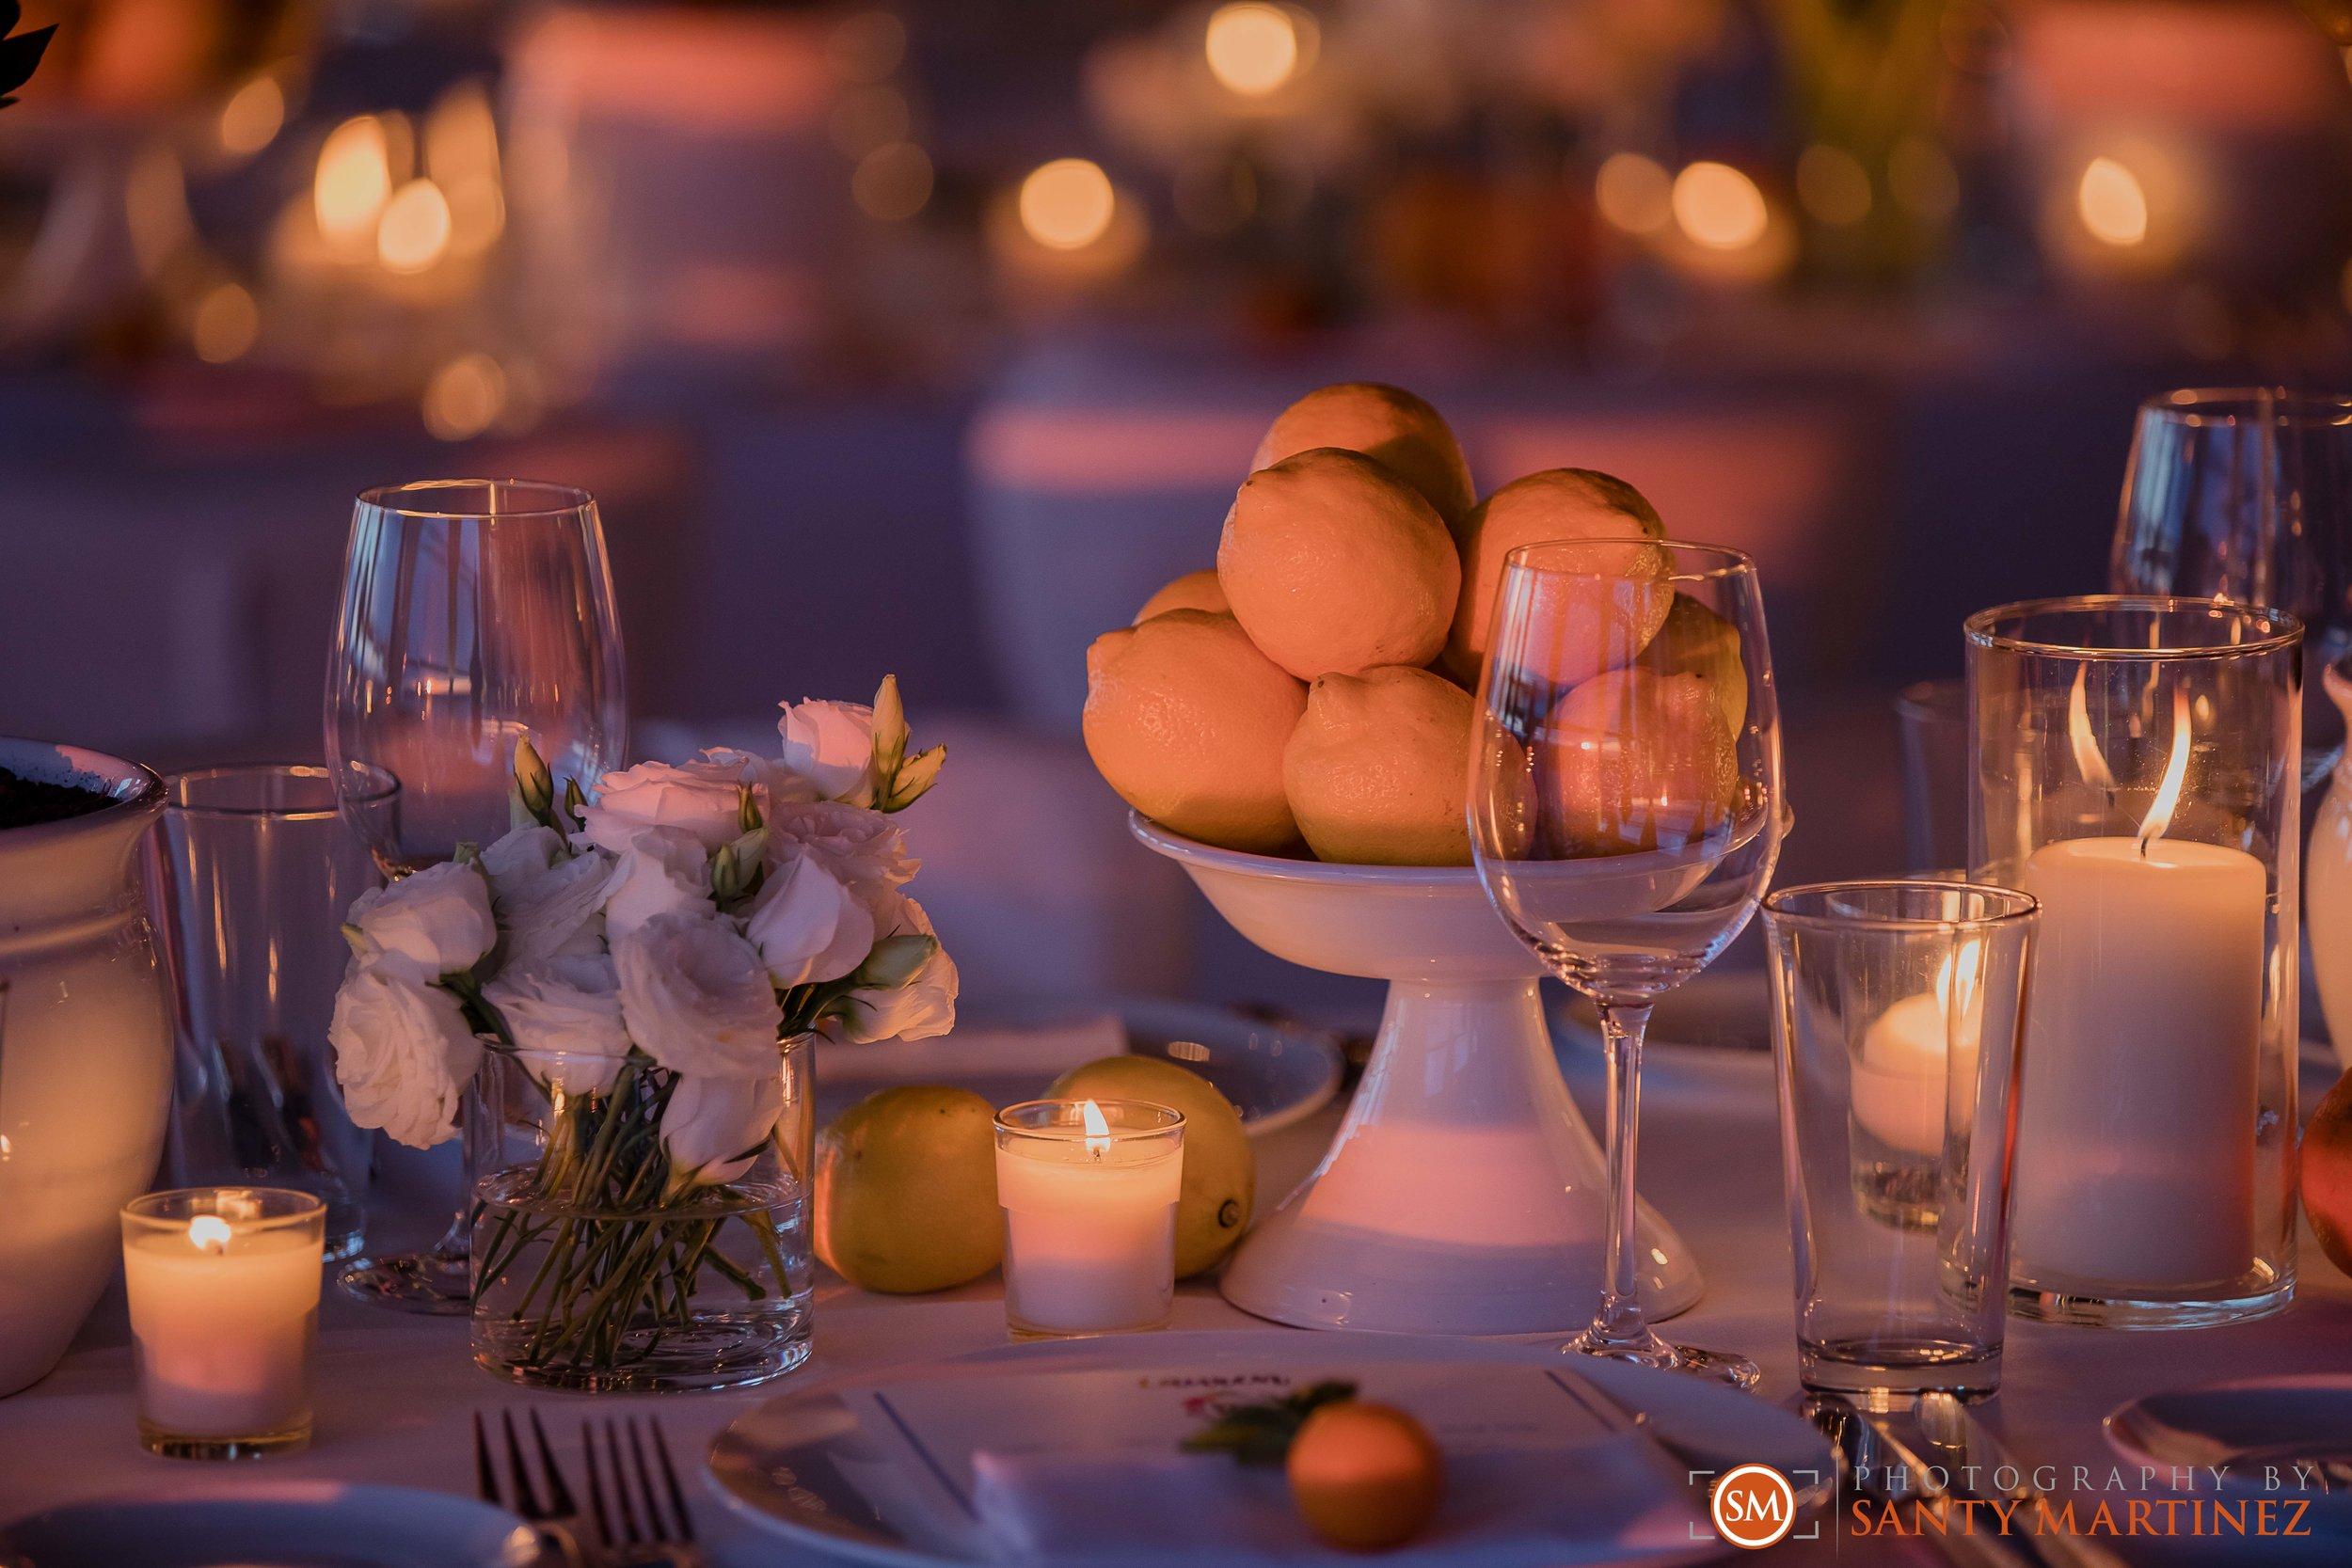 Wedding Capri Italy - Photography by Santy Martinez-61.jpg